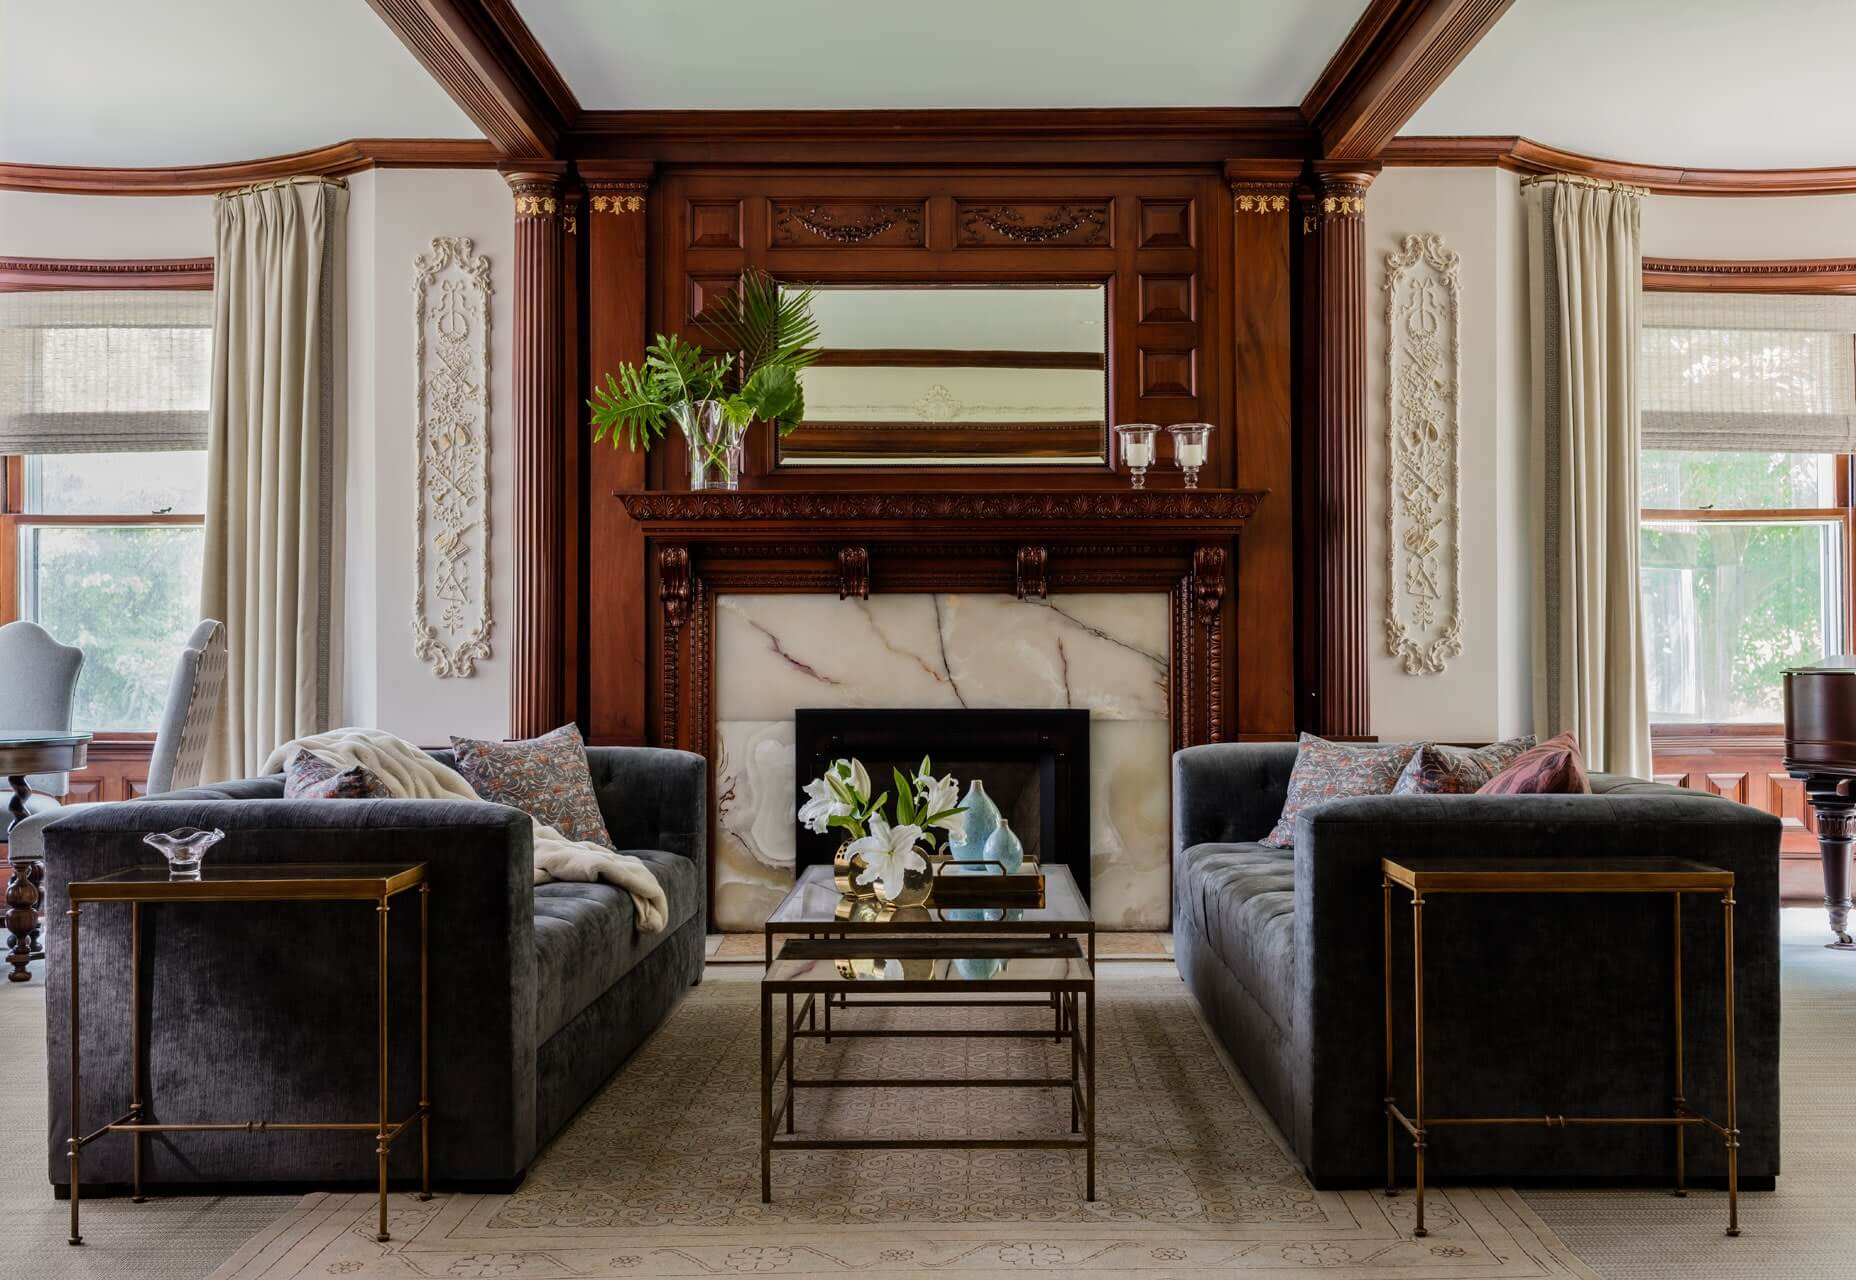 Victorian woodwork around marble fireplace